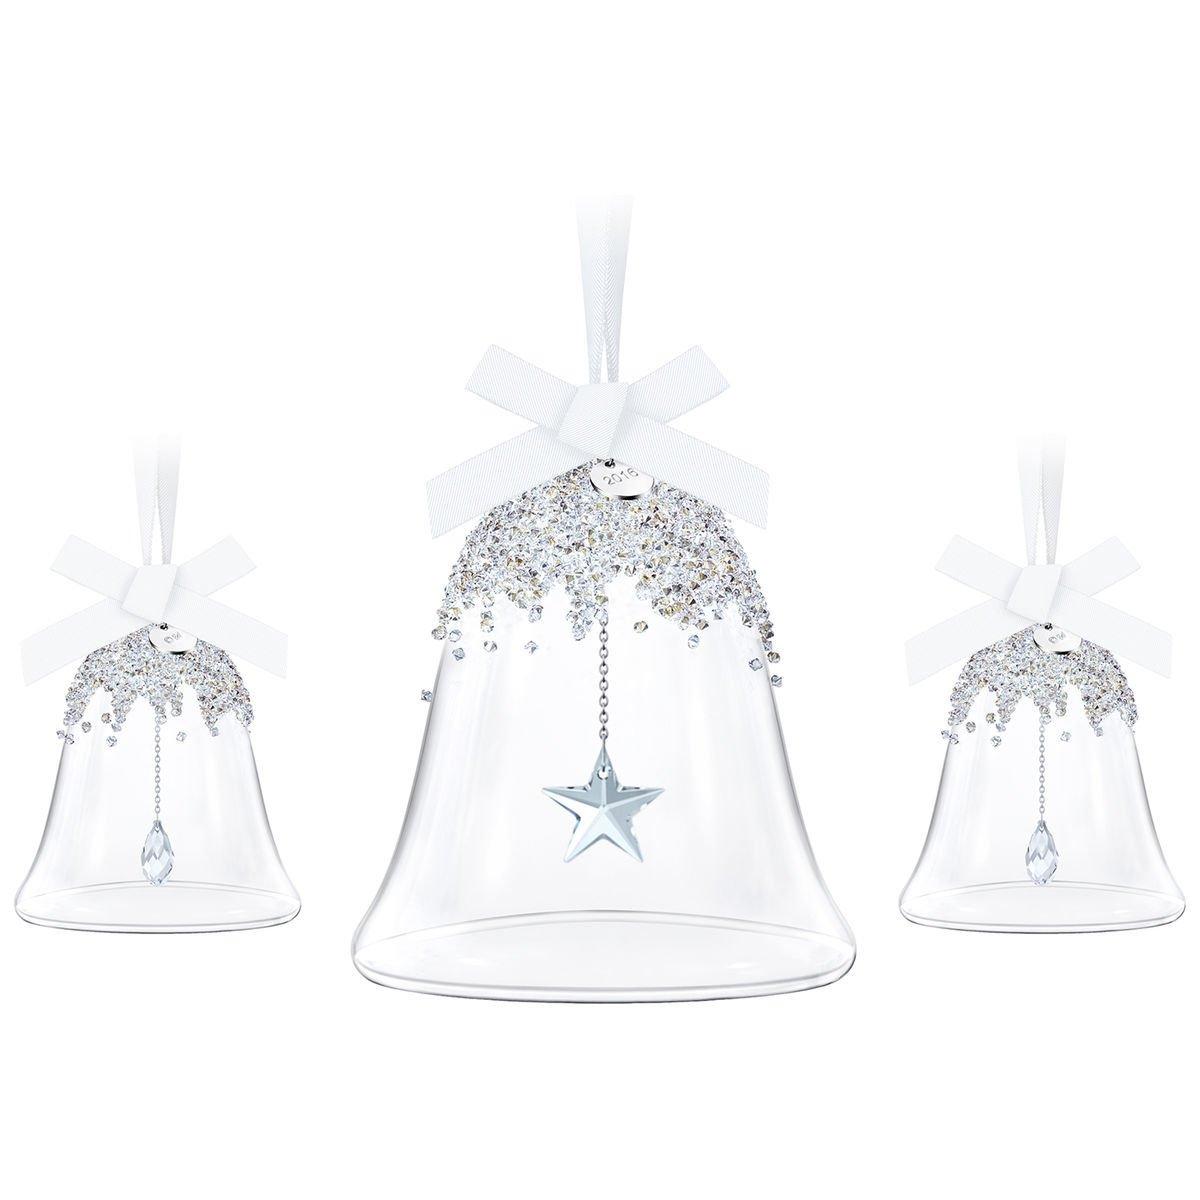 Swarovski Christmas Tree Decoration Set : Swarovski crystal christmas tree ornaments absolutely